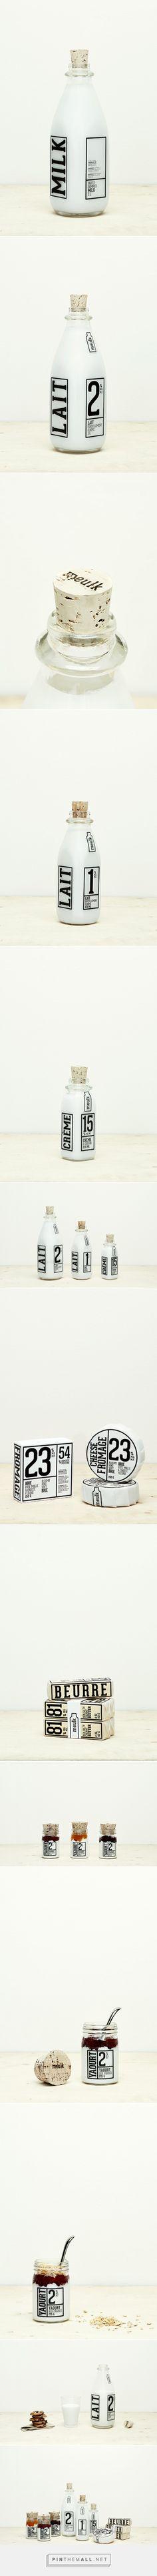 MEULK on Packaging Design Served